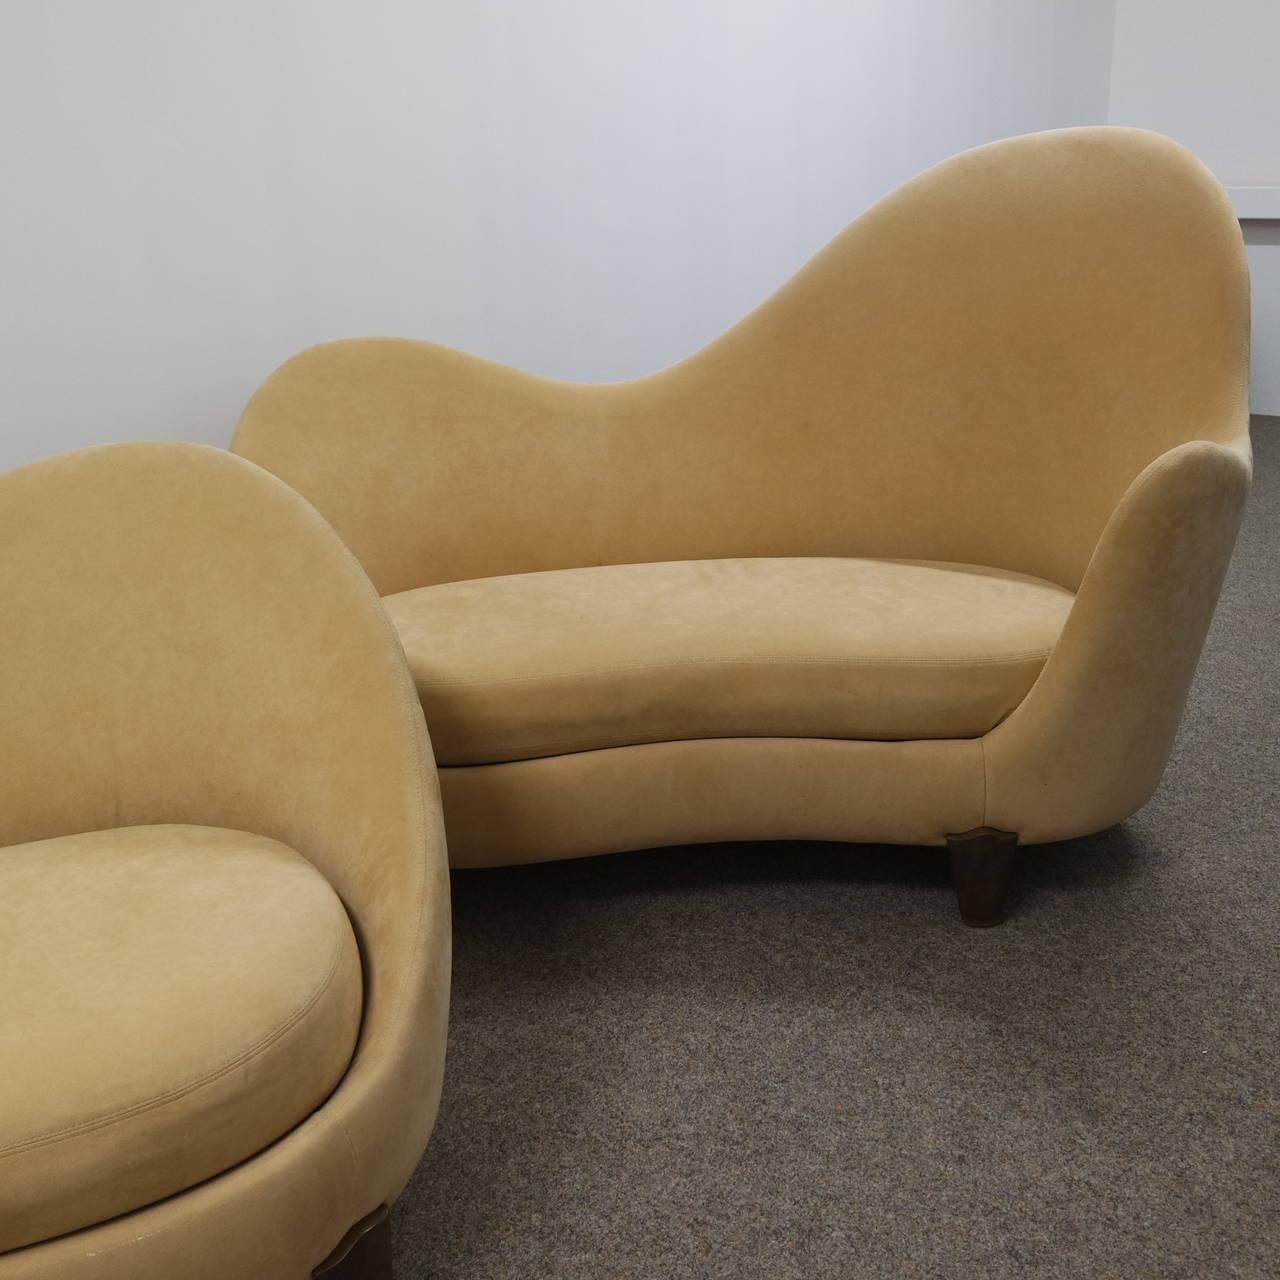 chair covers for sale port elizabeth folding camp chairs koala sofa by garouste and mattia bonetti